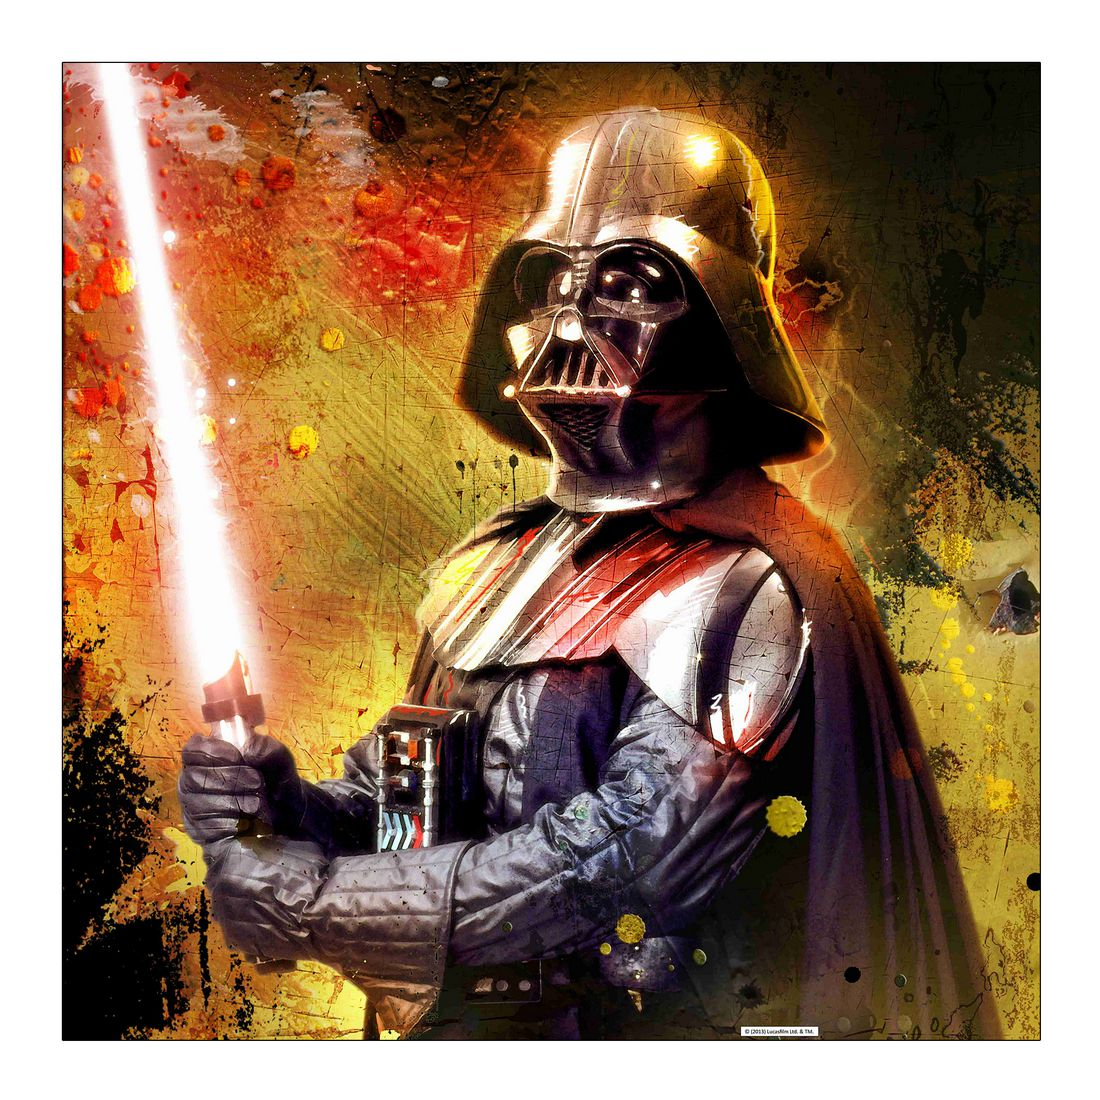 Leinwandbild Darth Vader – Sword – Abmessung 80×80 cm, Gallery of Innovative Art günstig kaufen